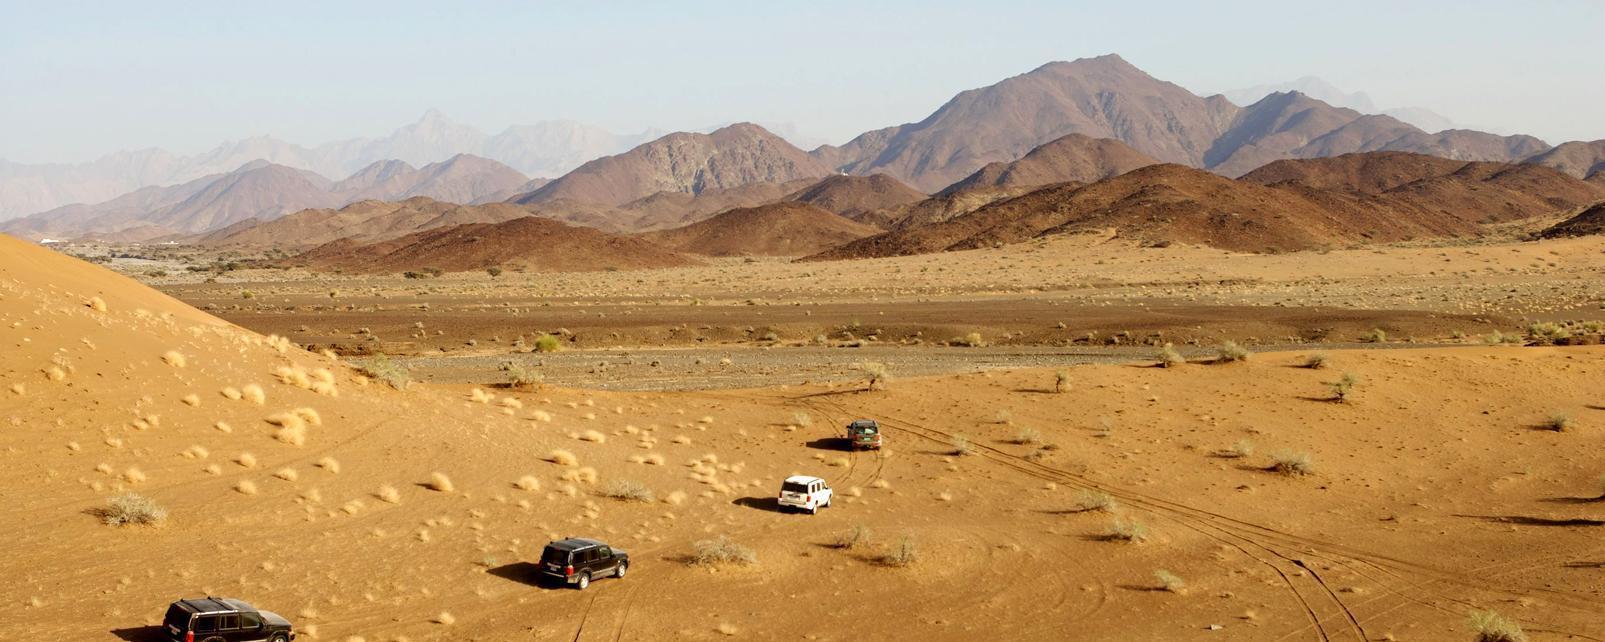 Moyen-Orient; Sultanat d'Oman; Al Wasil;